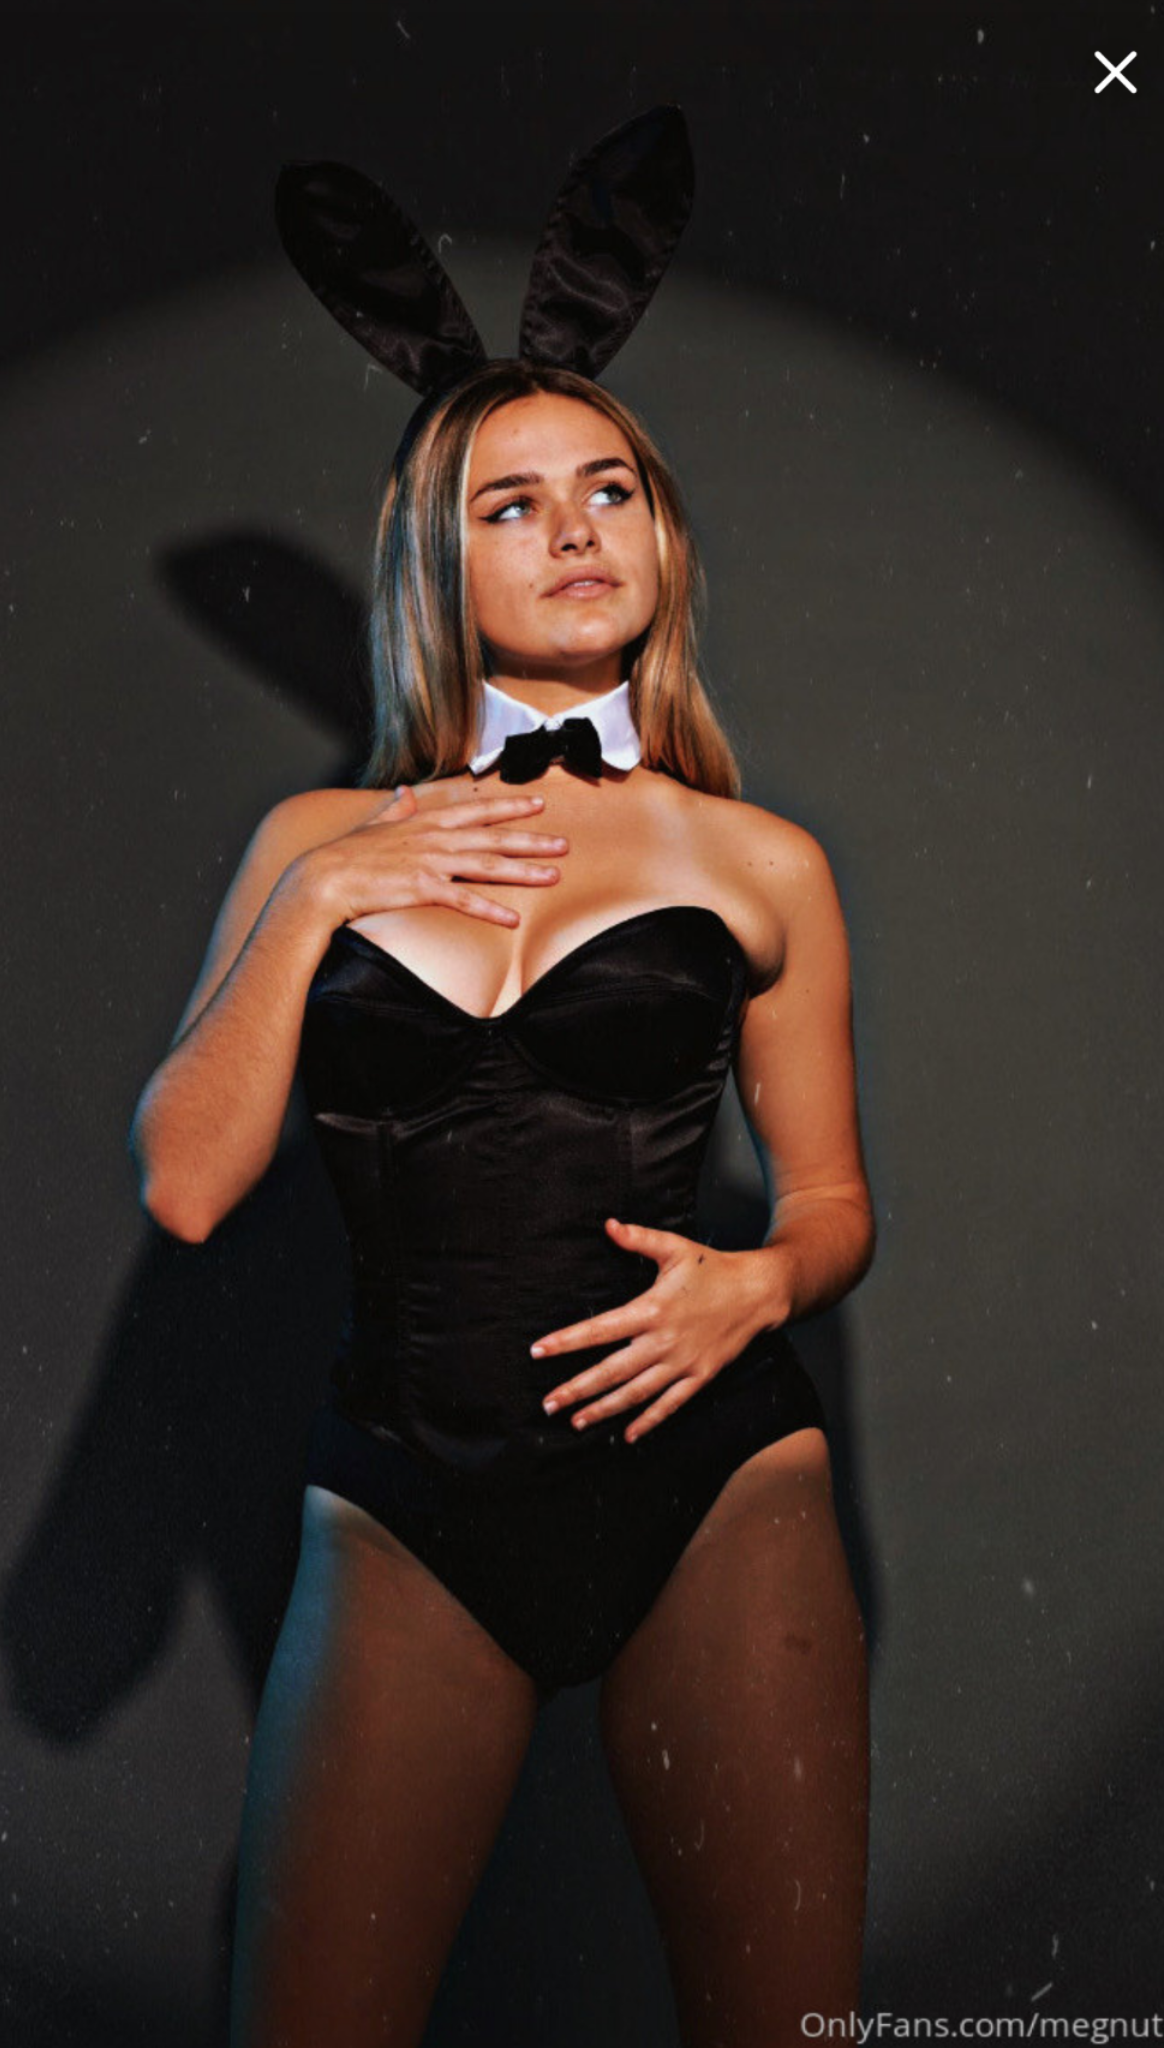 Megan Guthrie Nude Leaked 0003